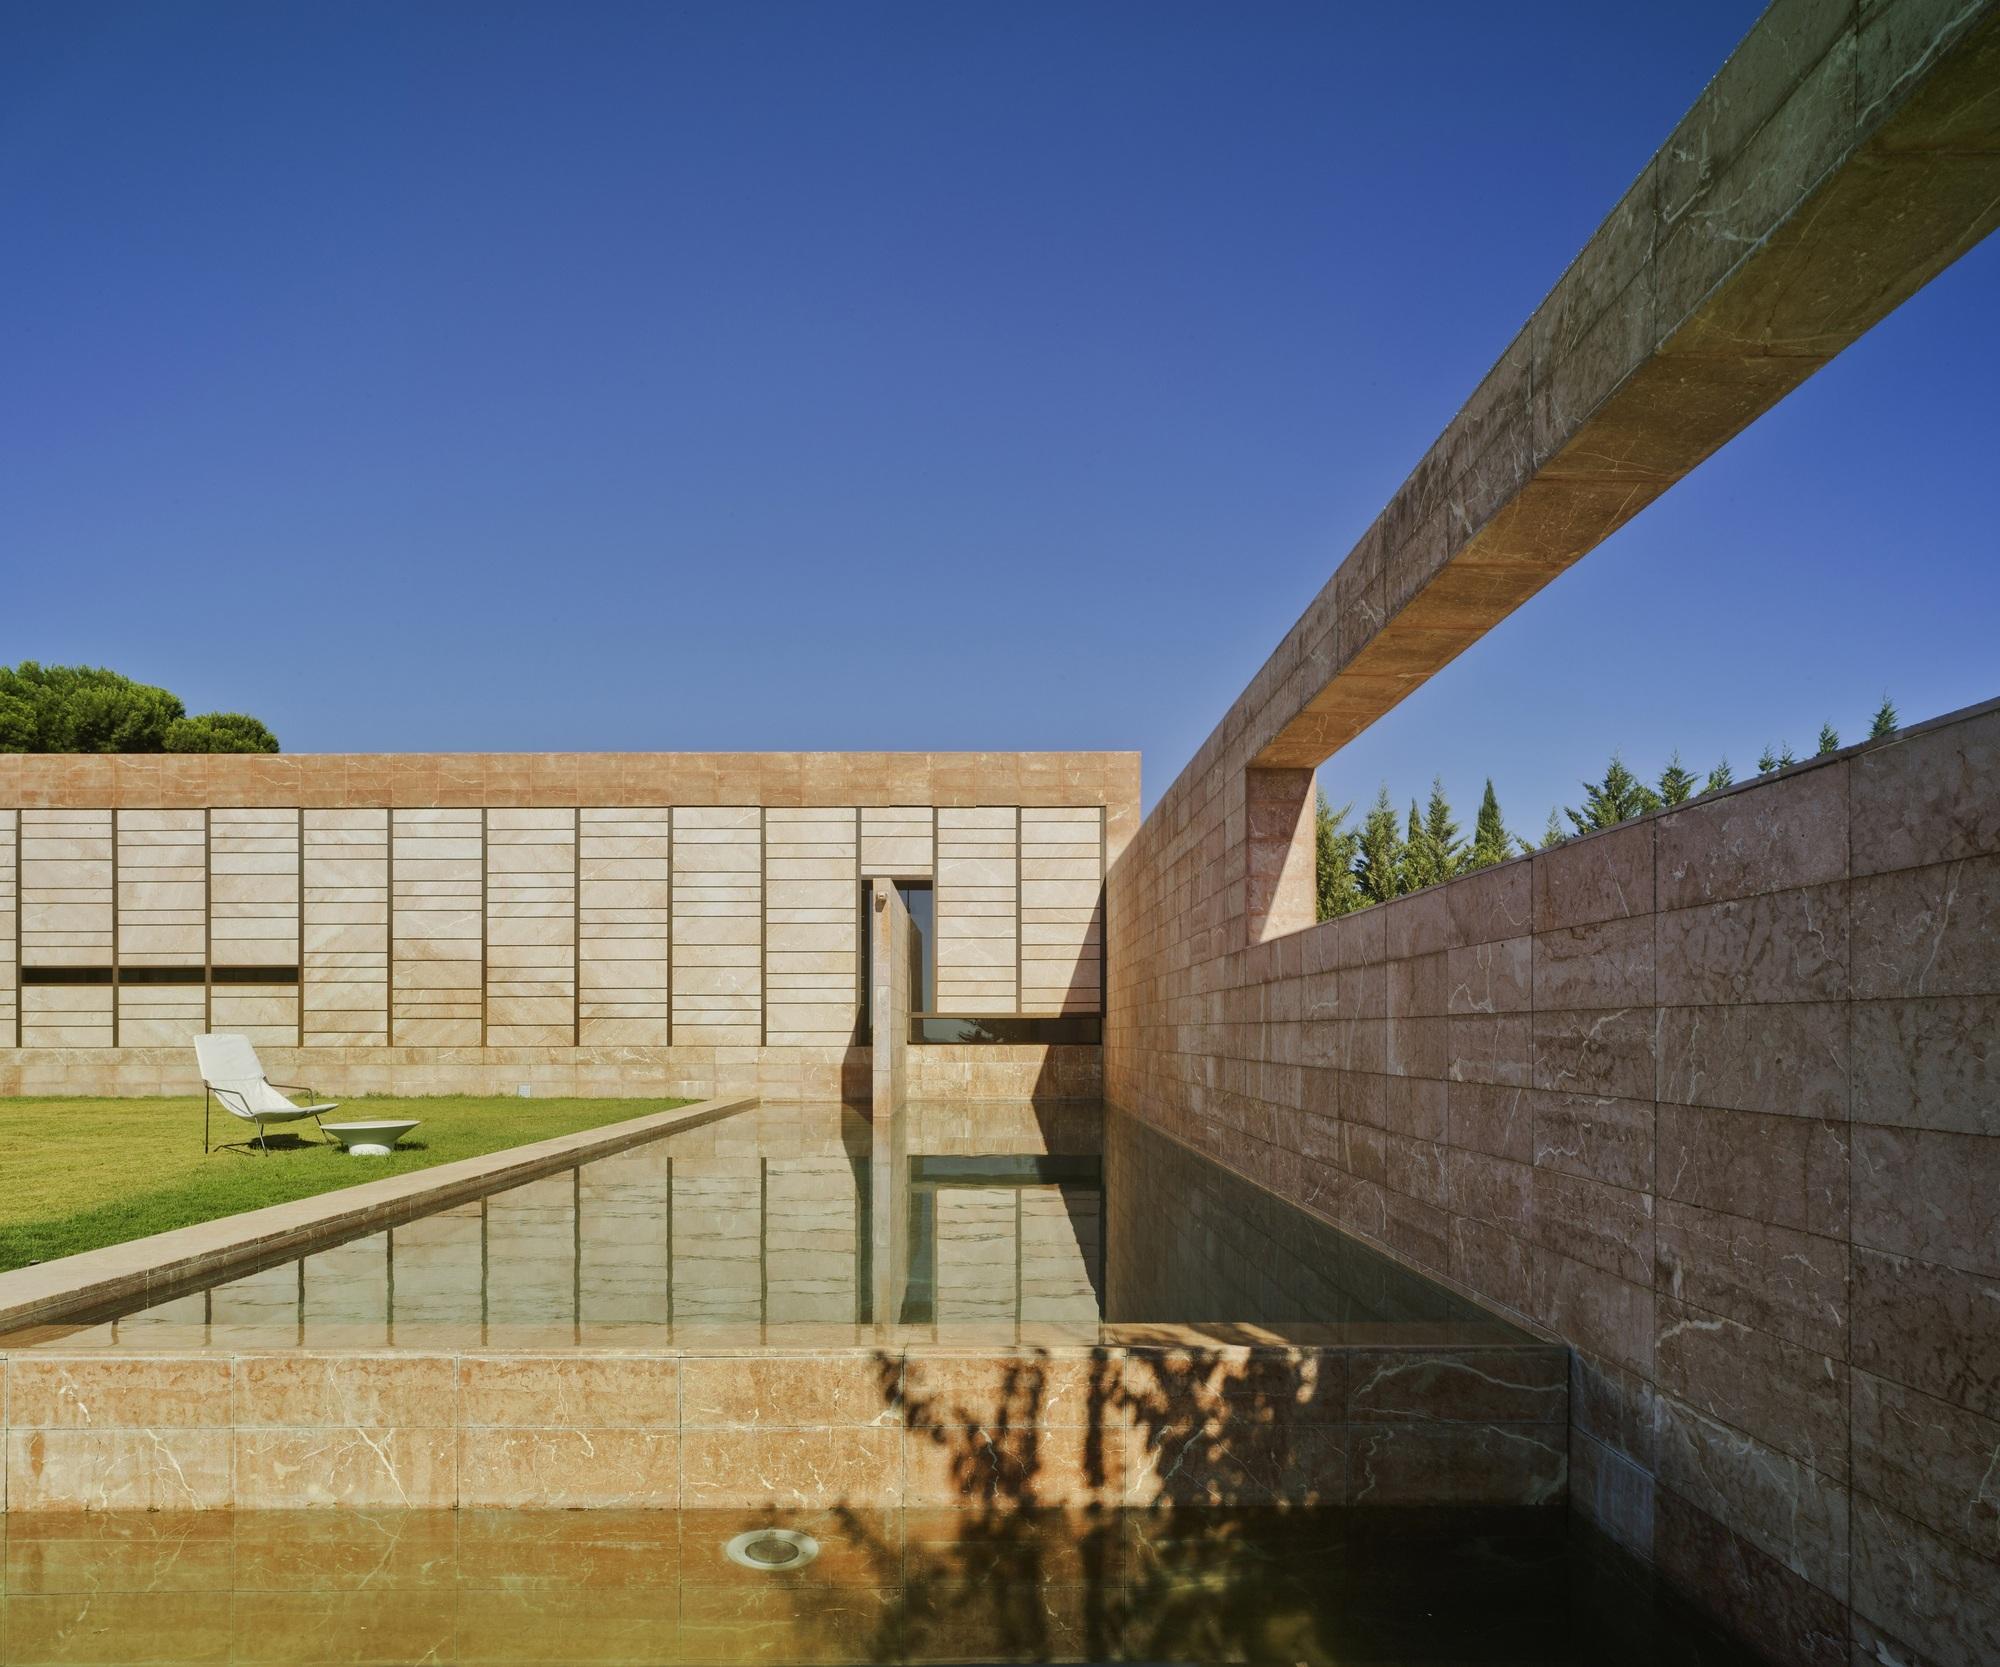 Spa hotel la romana isaac peral codina plataforma for Plataforma arquitectura